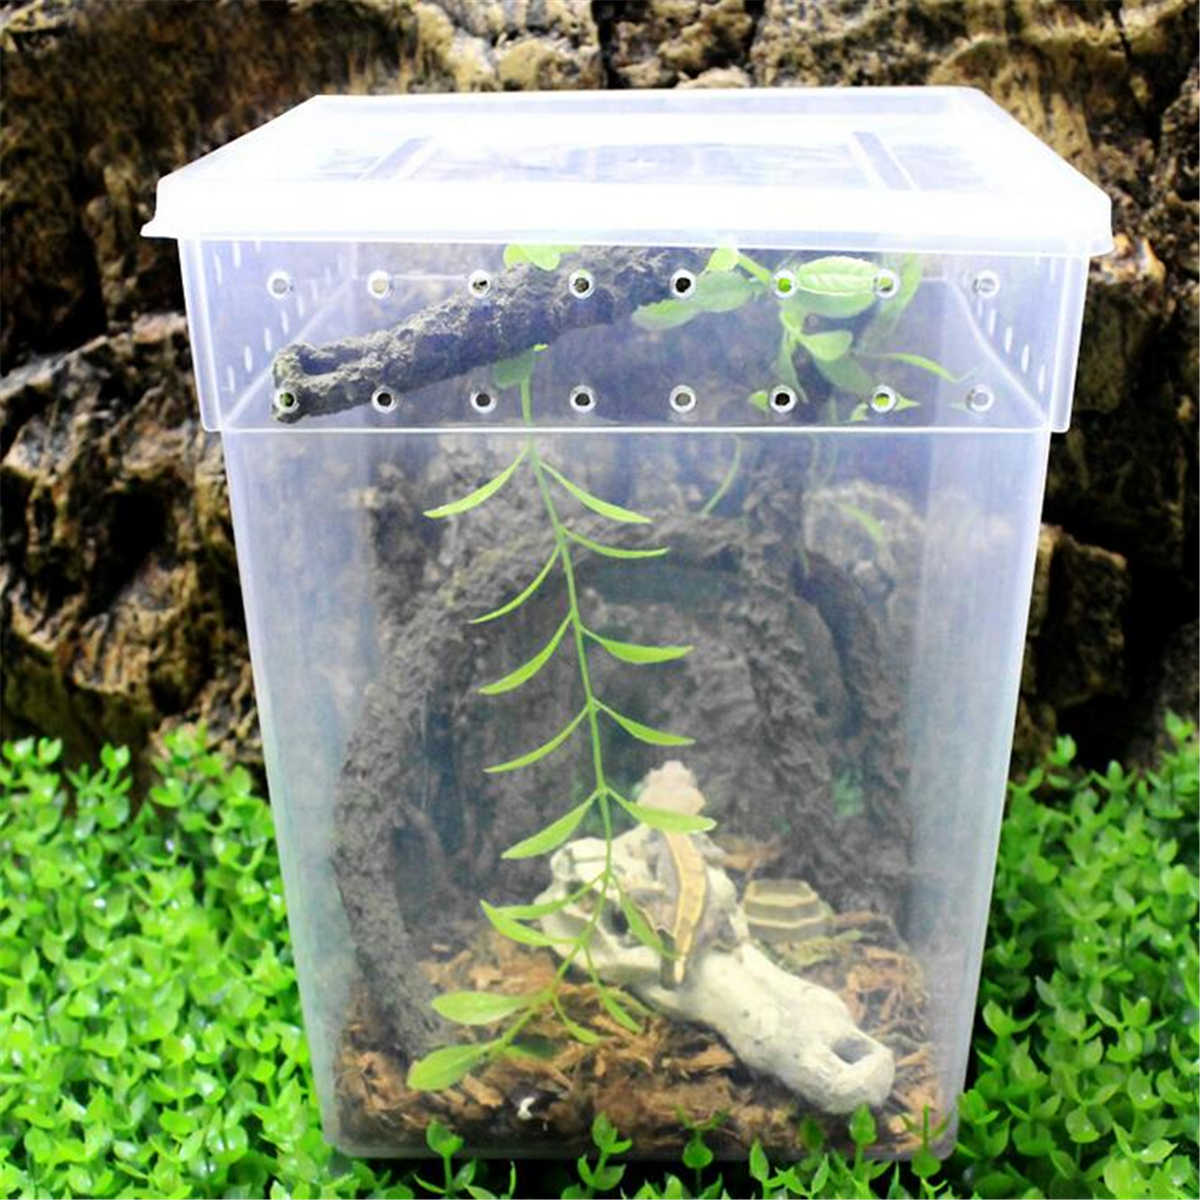 Transparan Peliharaan Reptil Tangki Makan Terrariums Serangga Kadal Ular Laba-laba Breeding Kotak Kandang Rumah Reptil Aksesoris